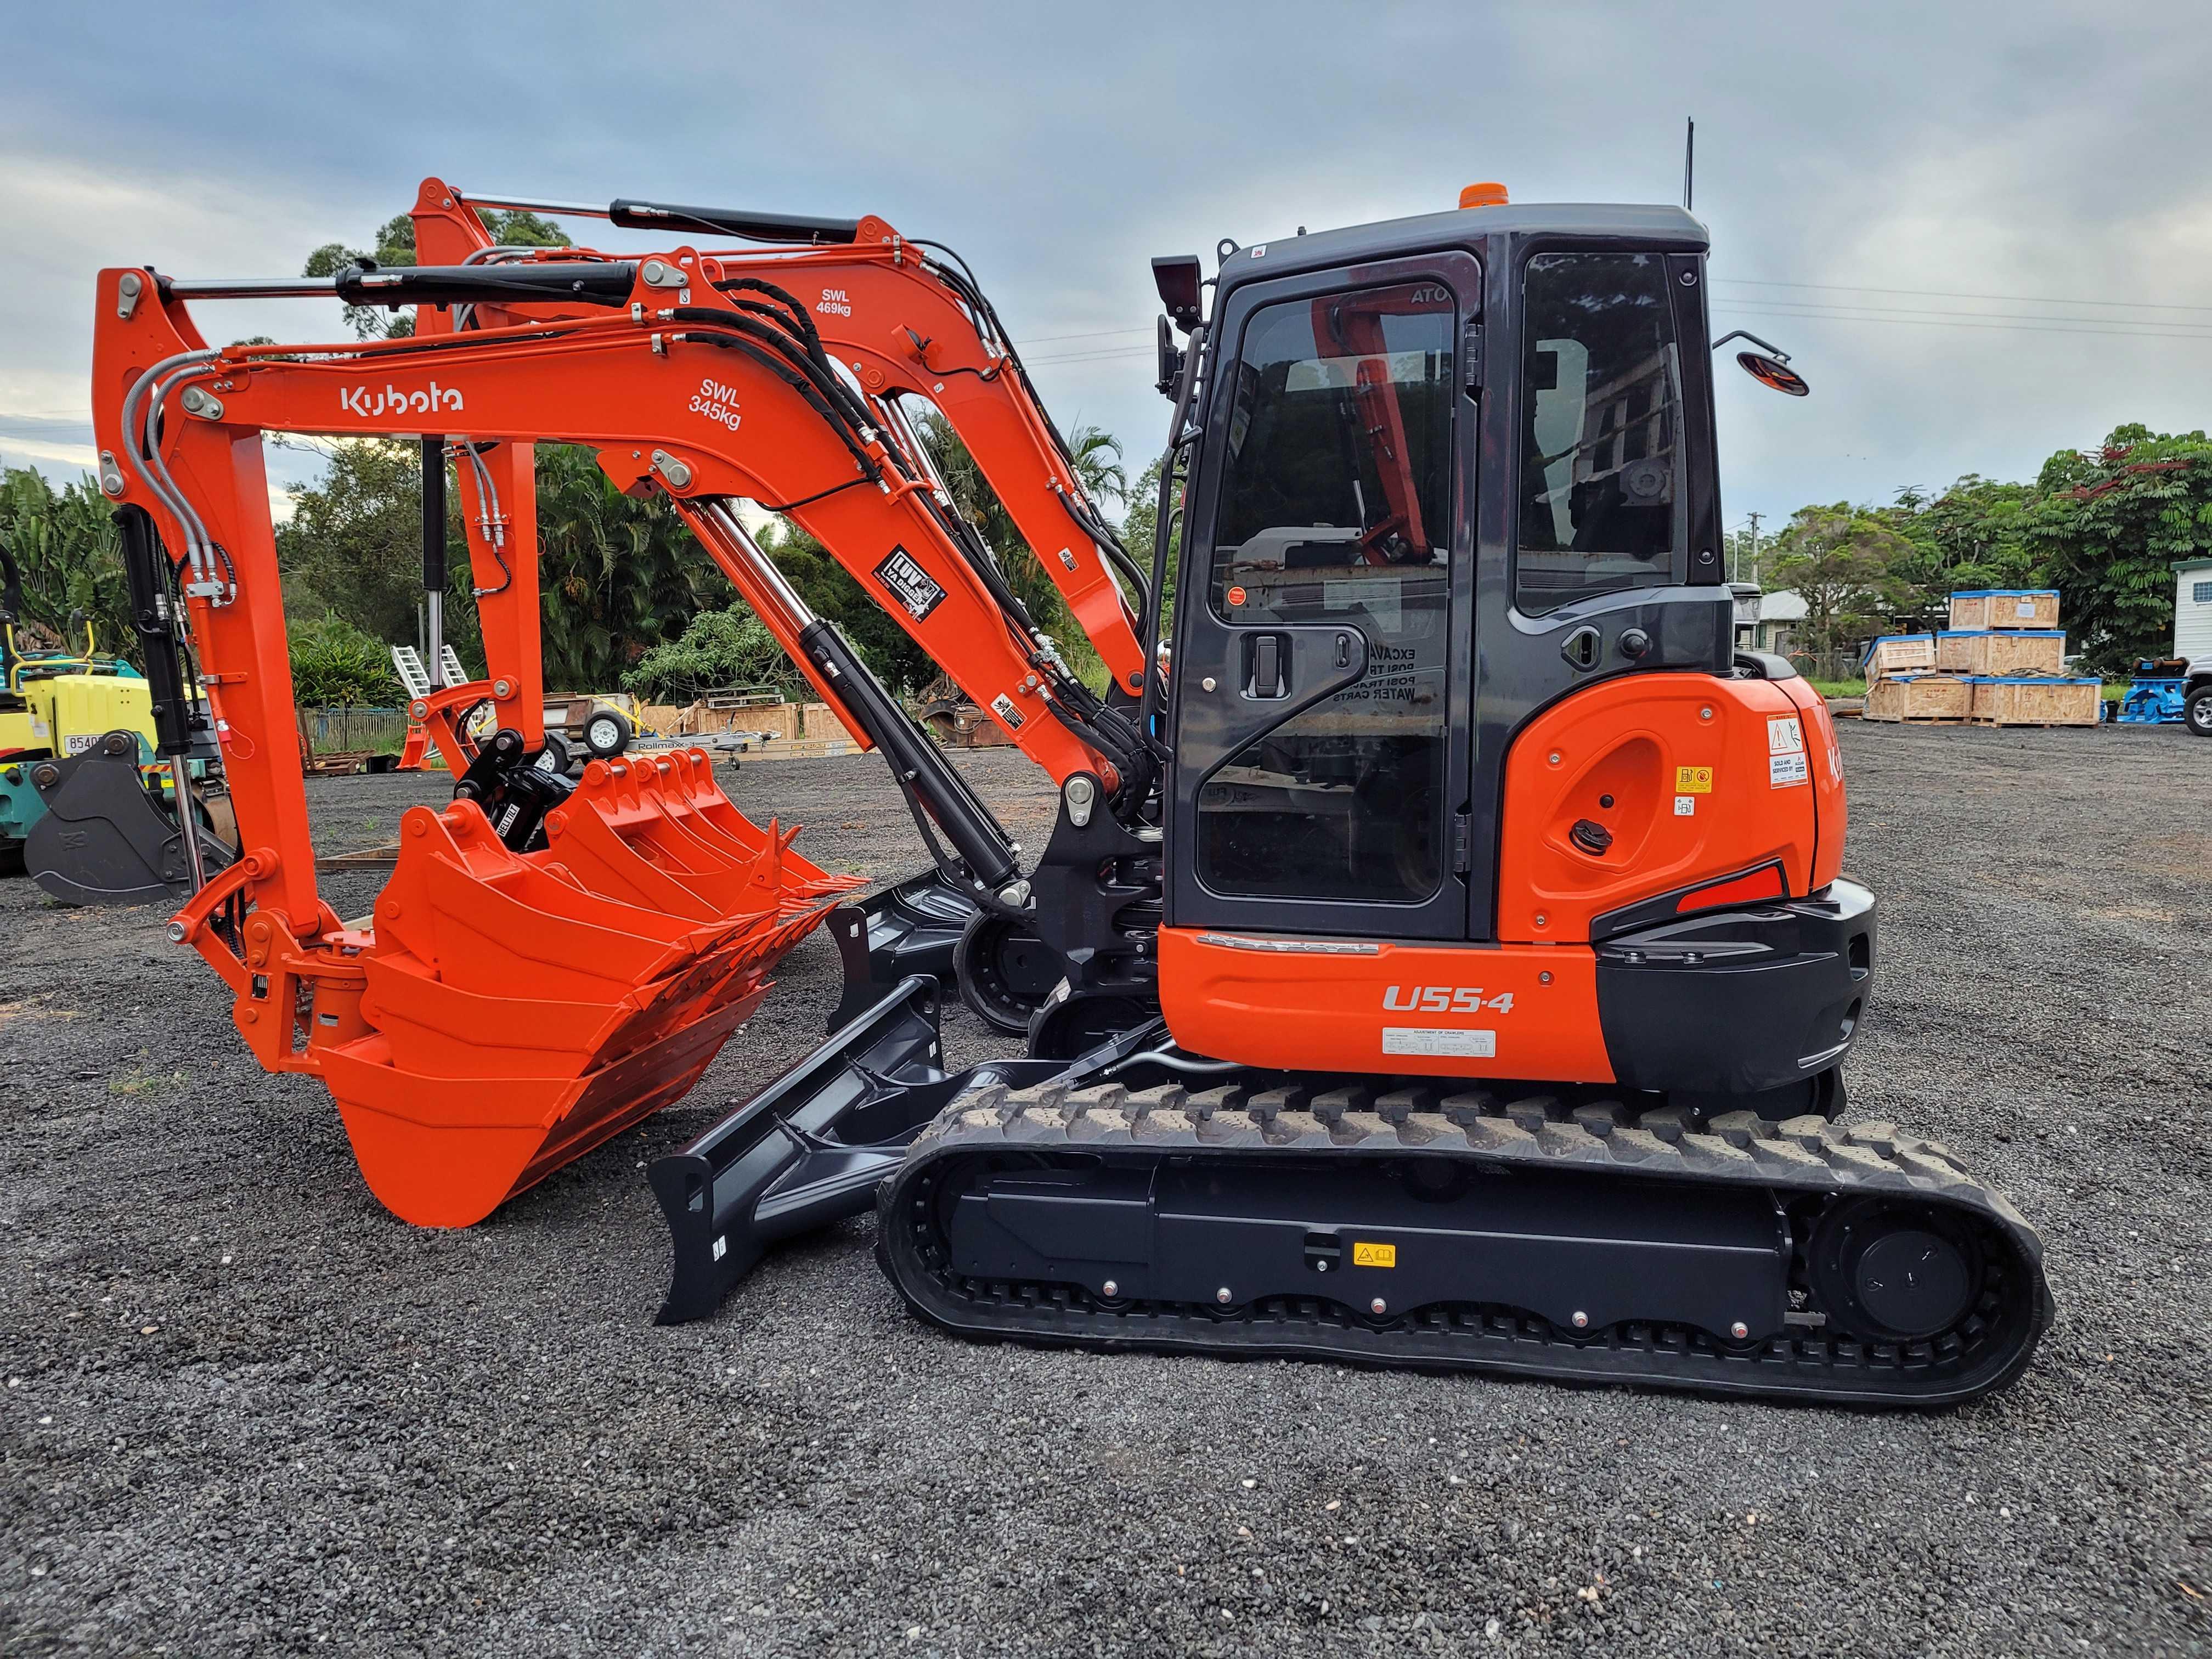 Hire 3.5-5t Tracked Excavators